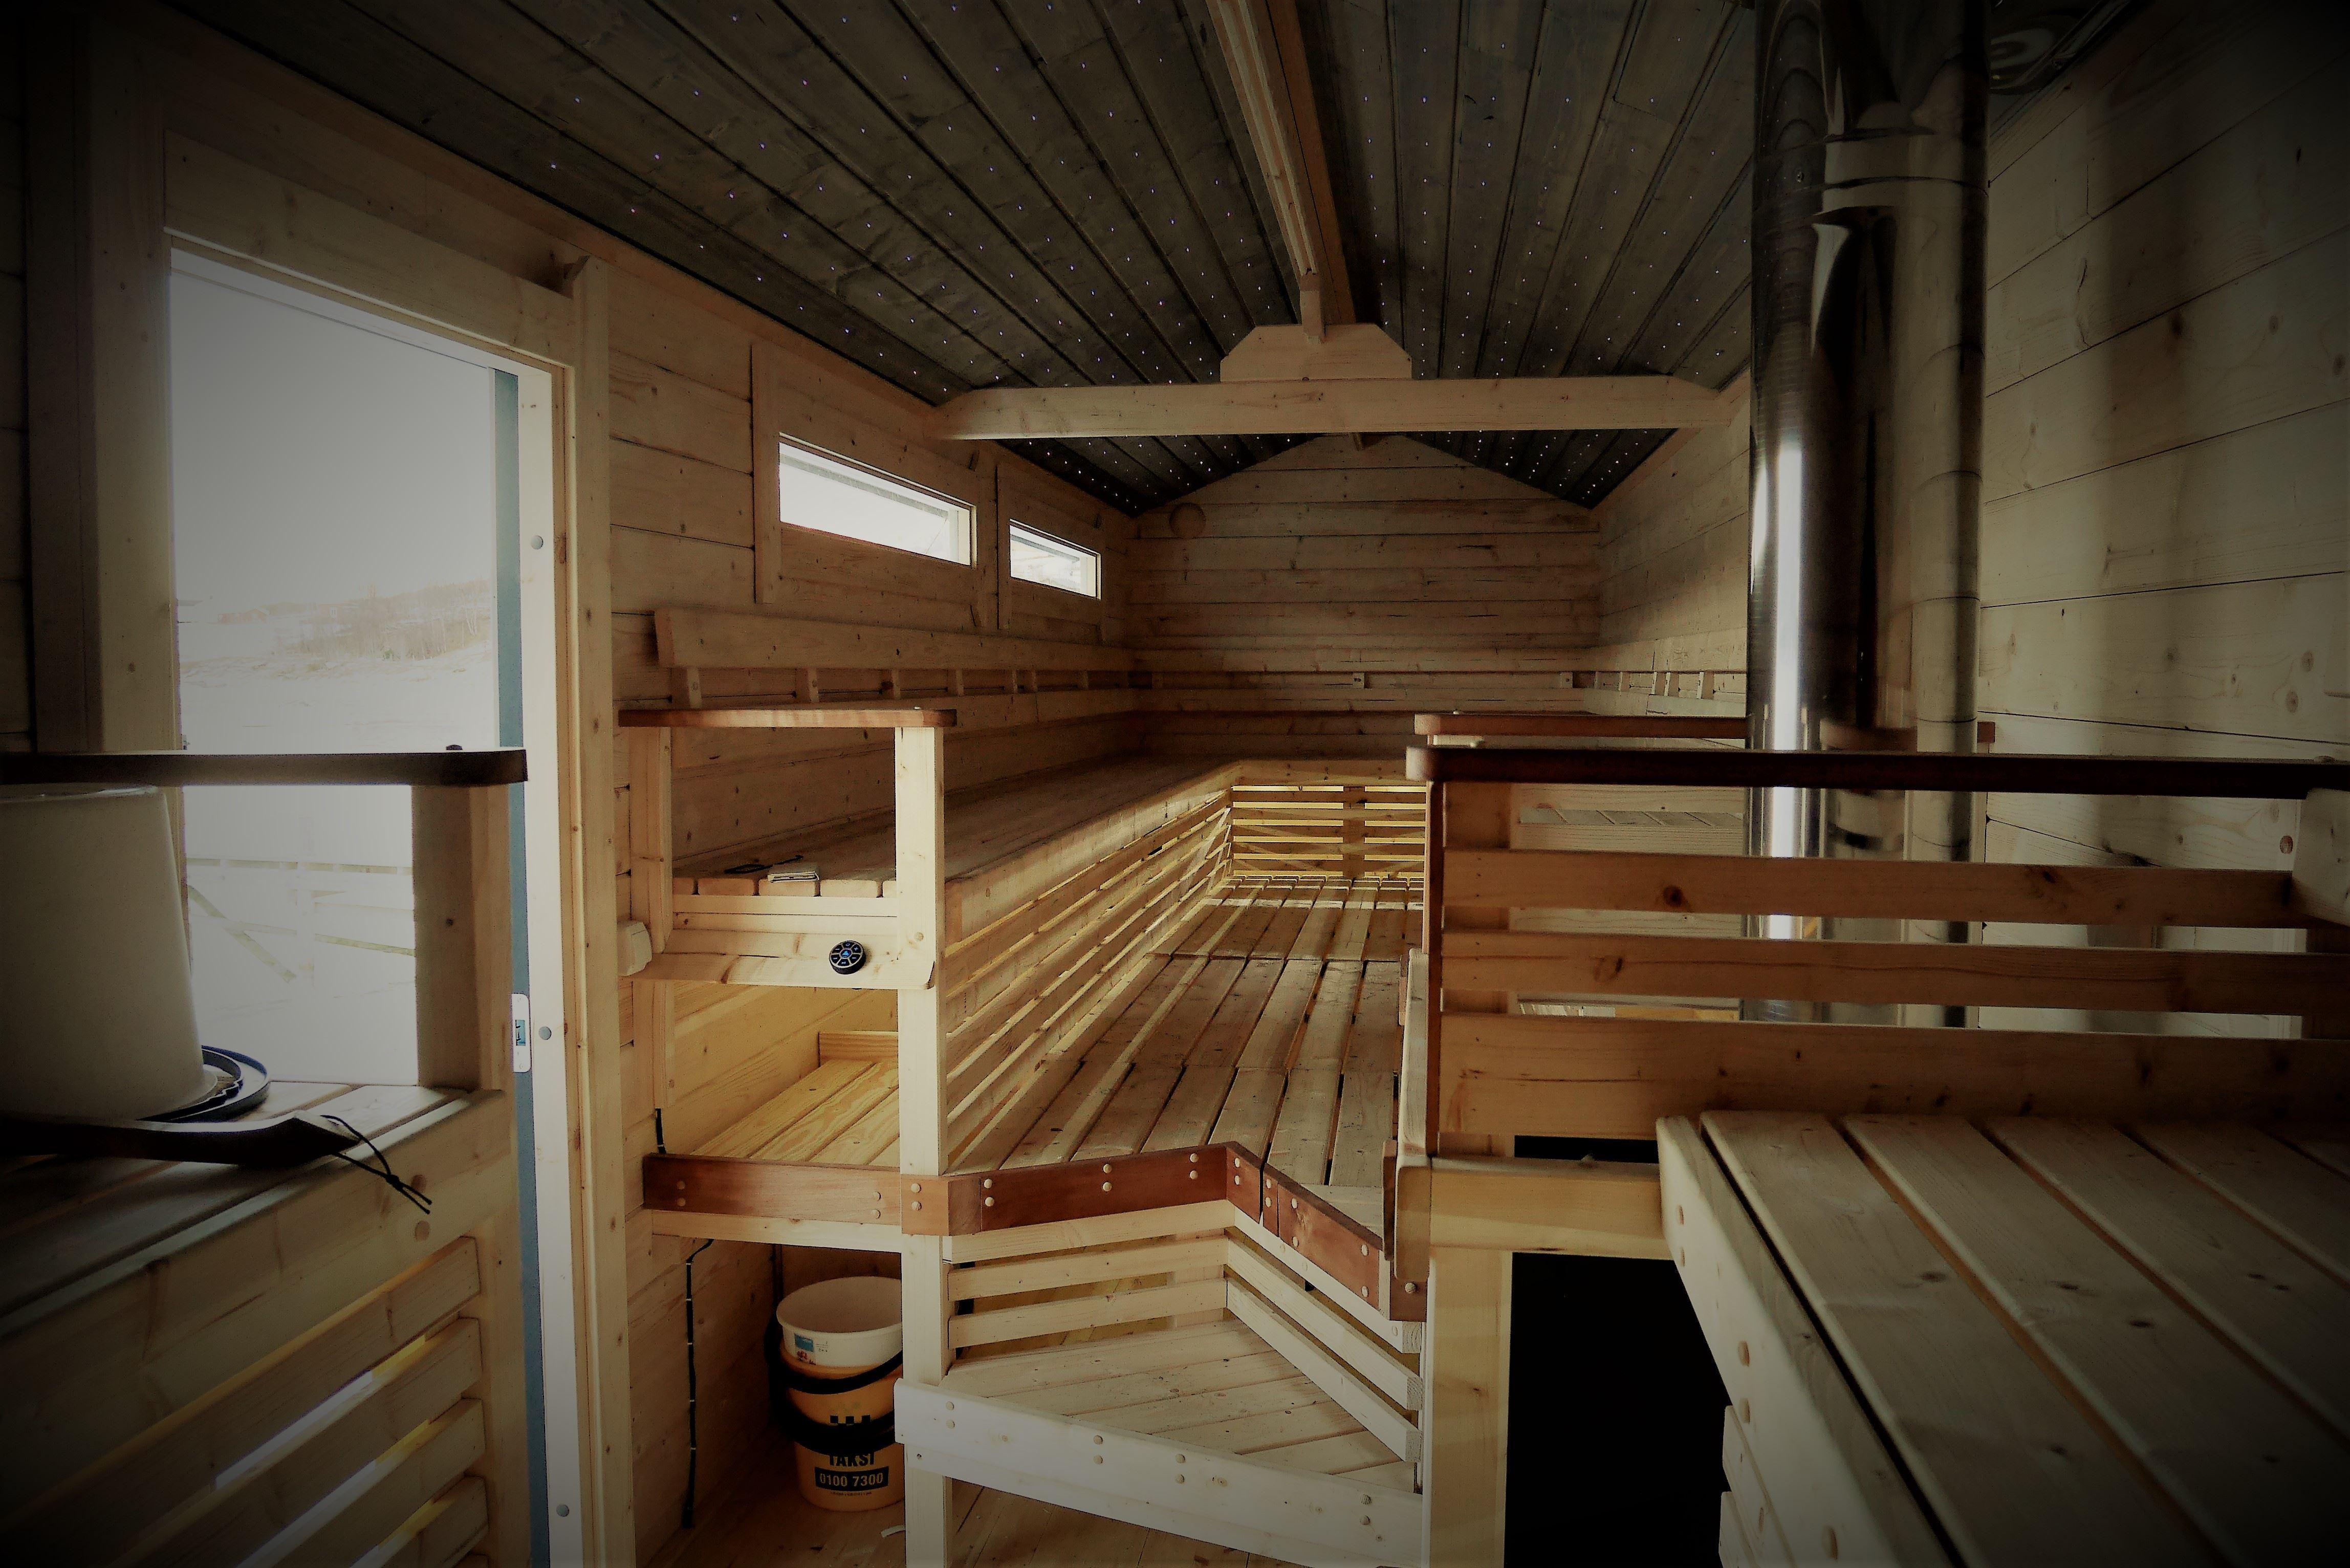 LyngenTourist - Arctic swimming and sauna